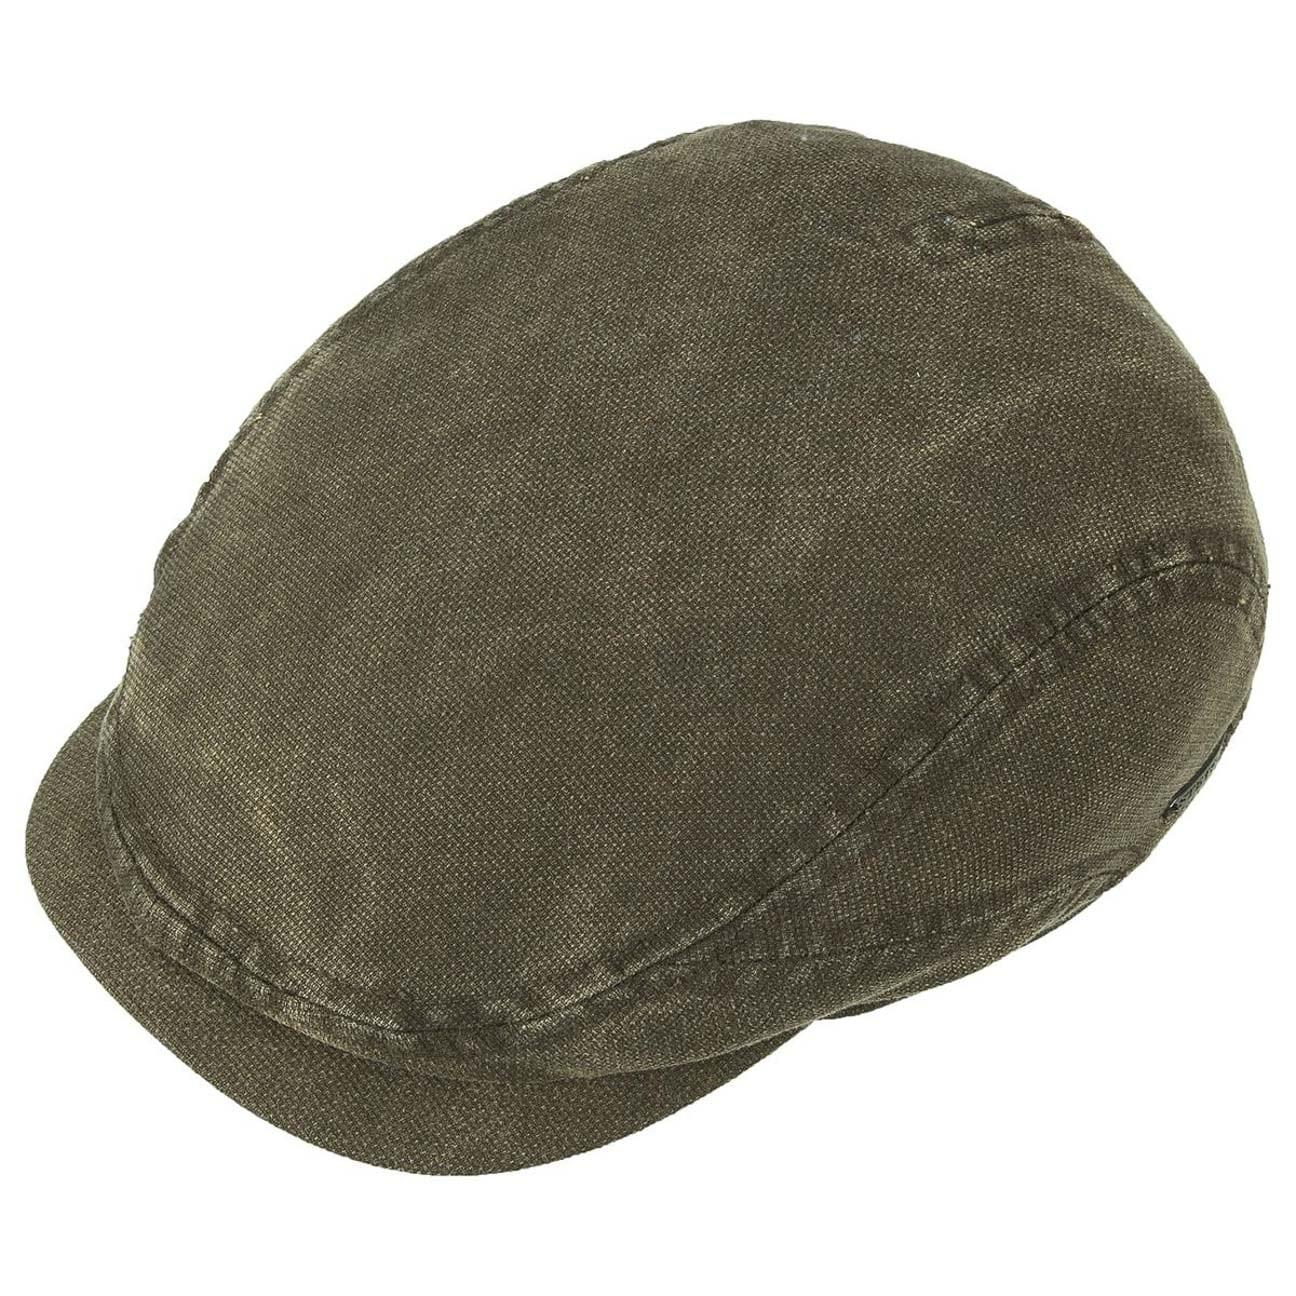 Belfast Cotton Flat Cap by Stetson - olive 2 ... c03832743a1